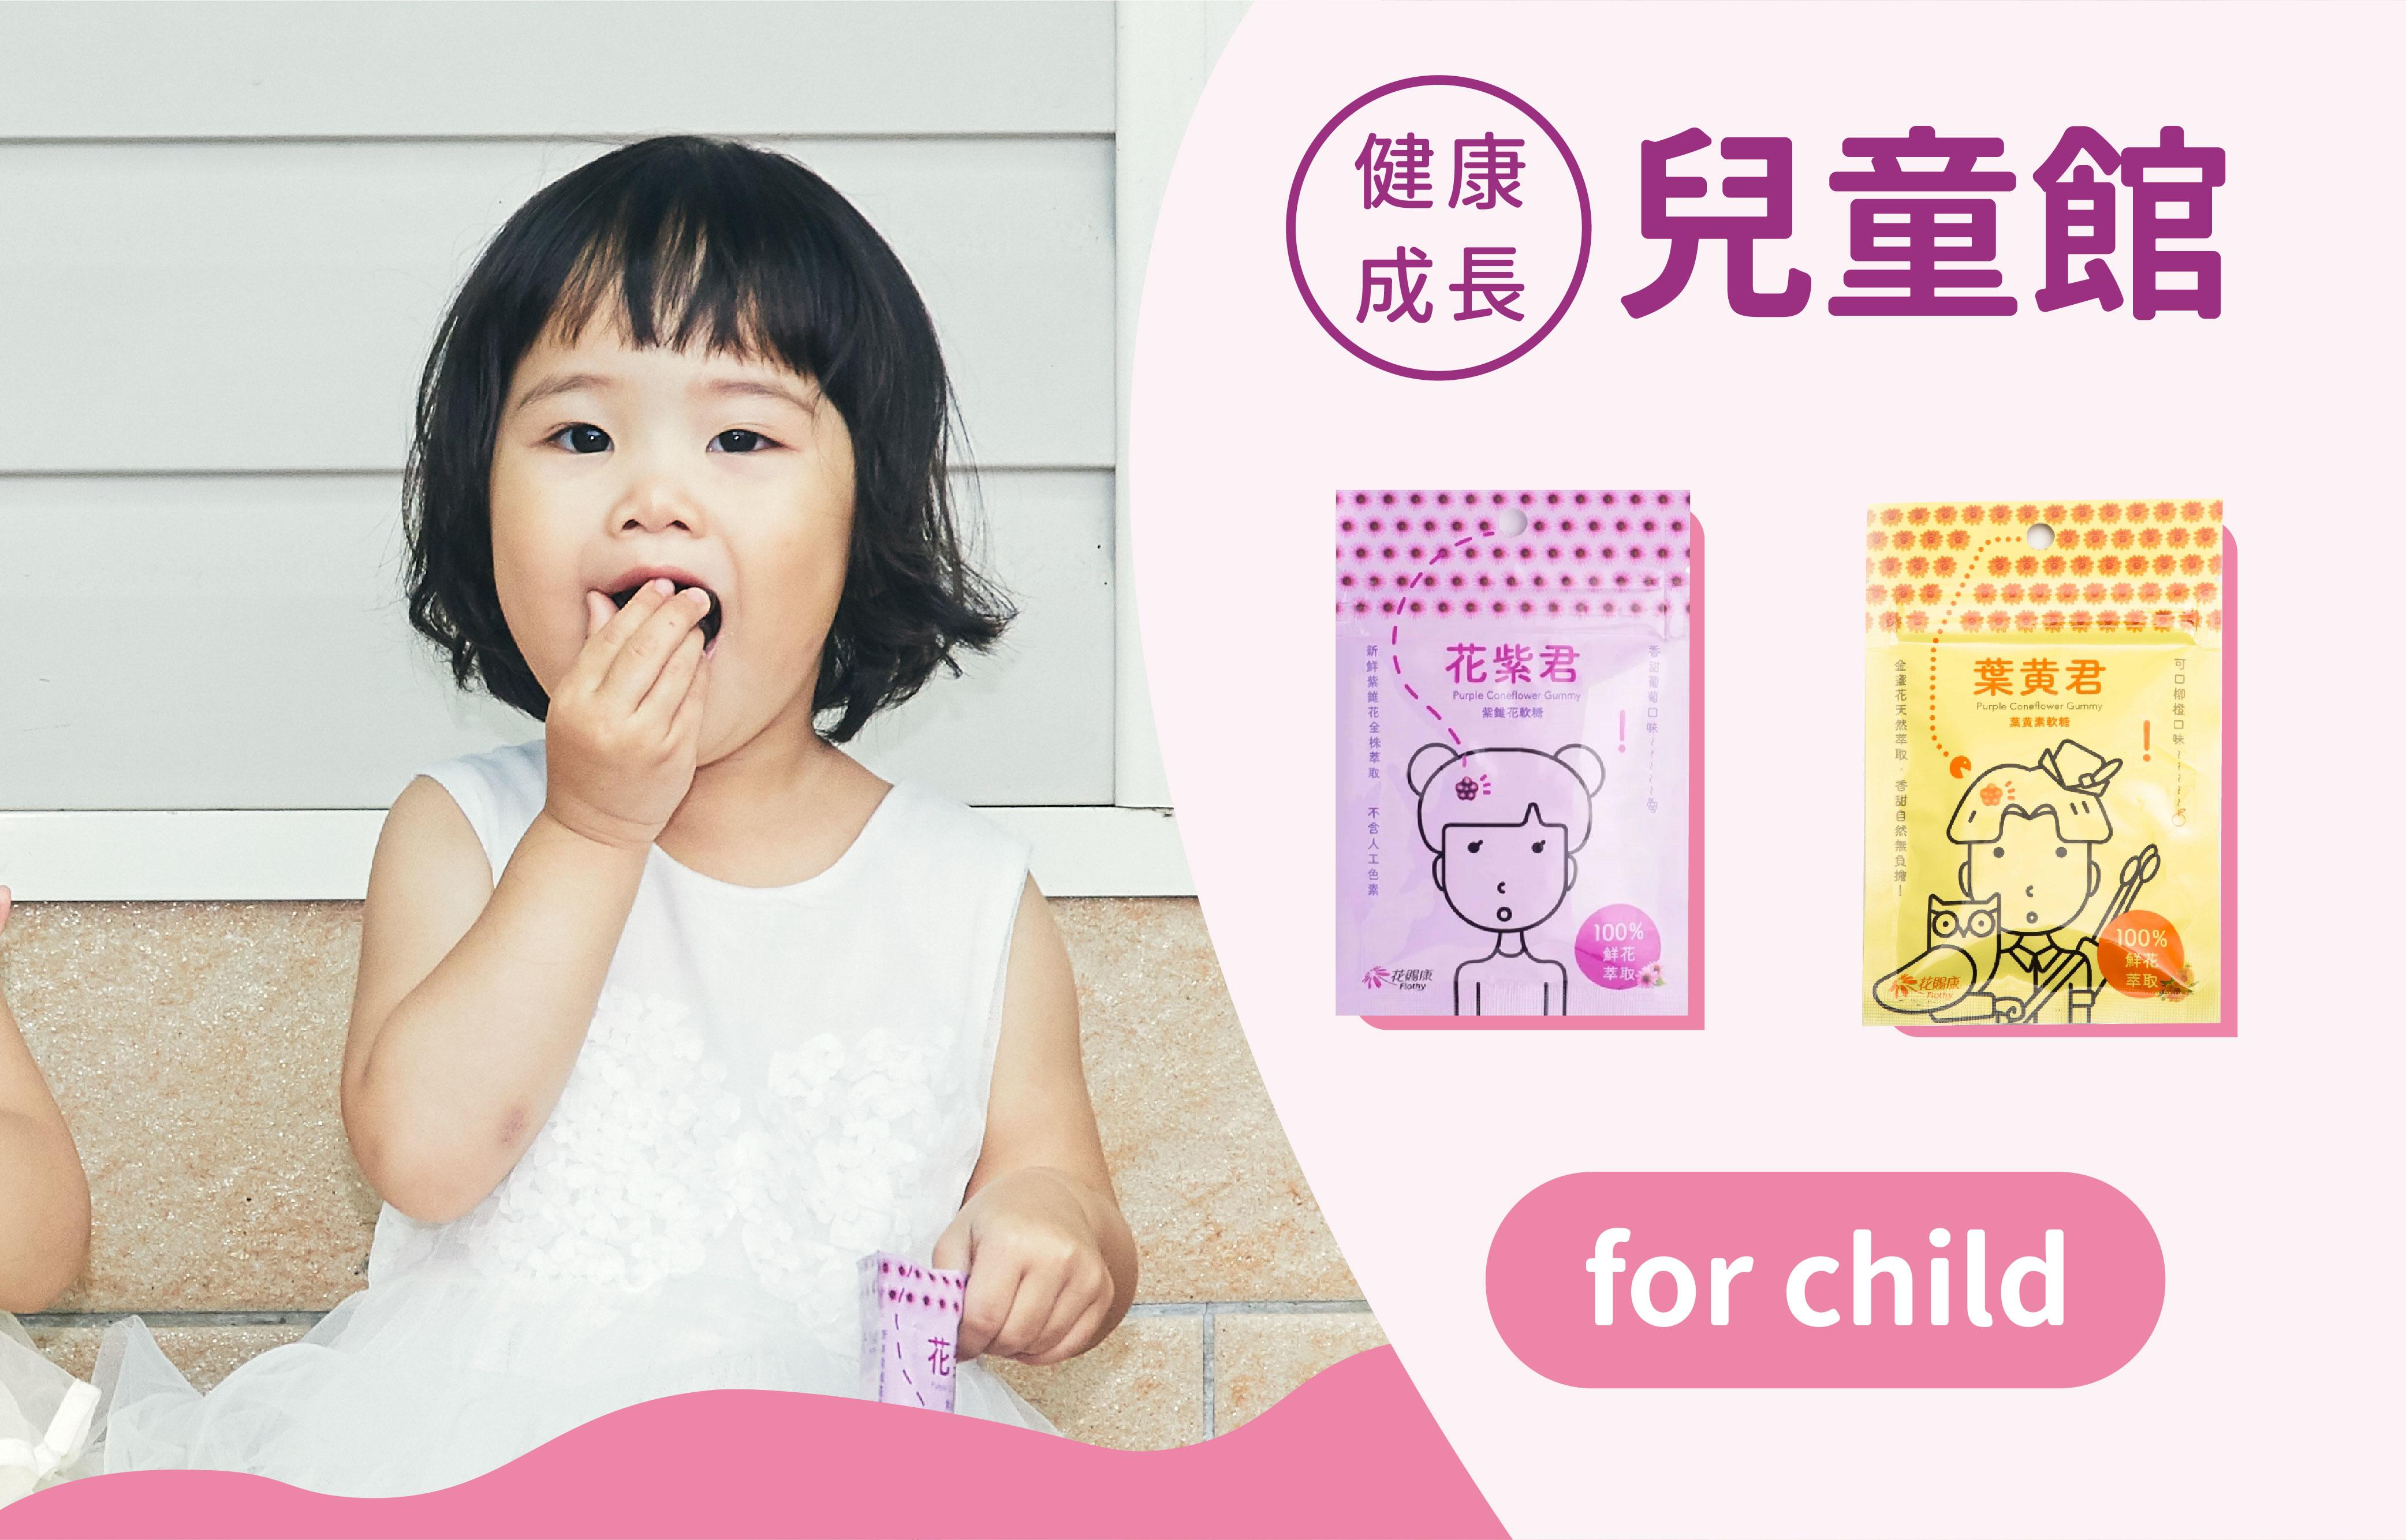 flothy-goods-child